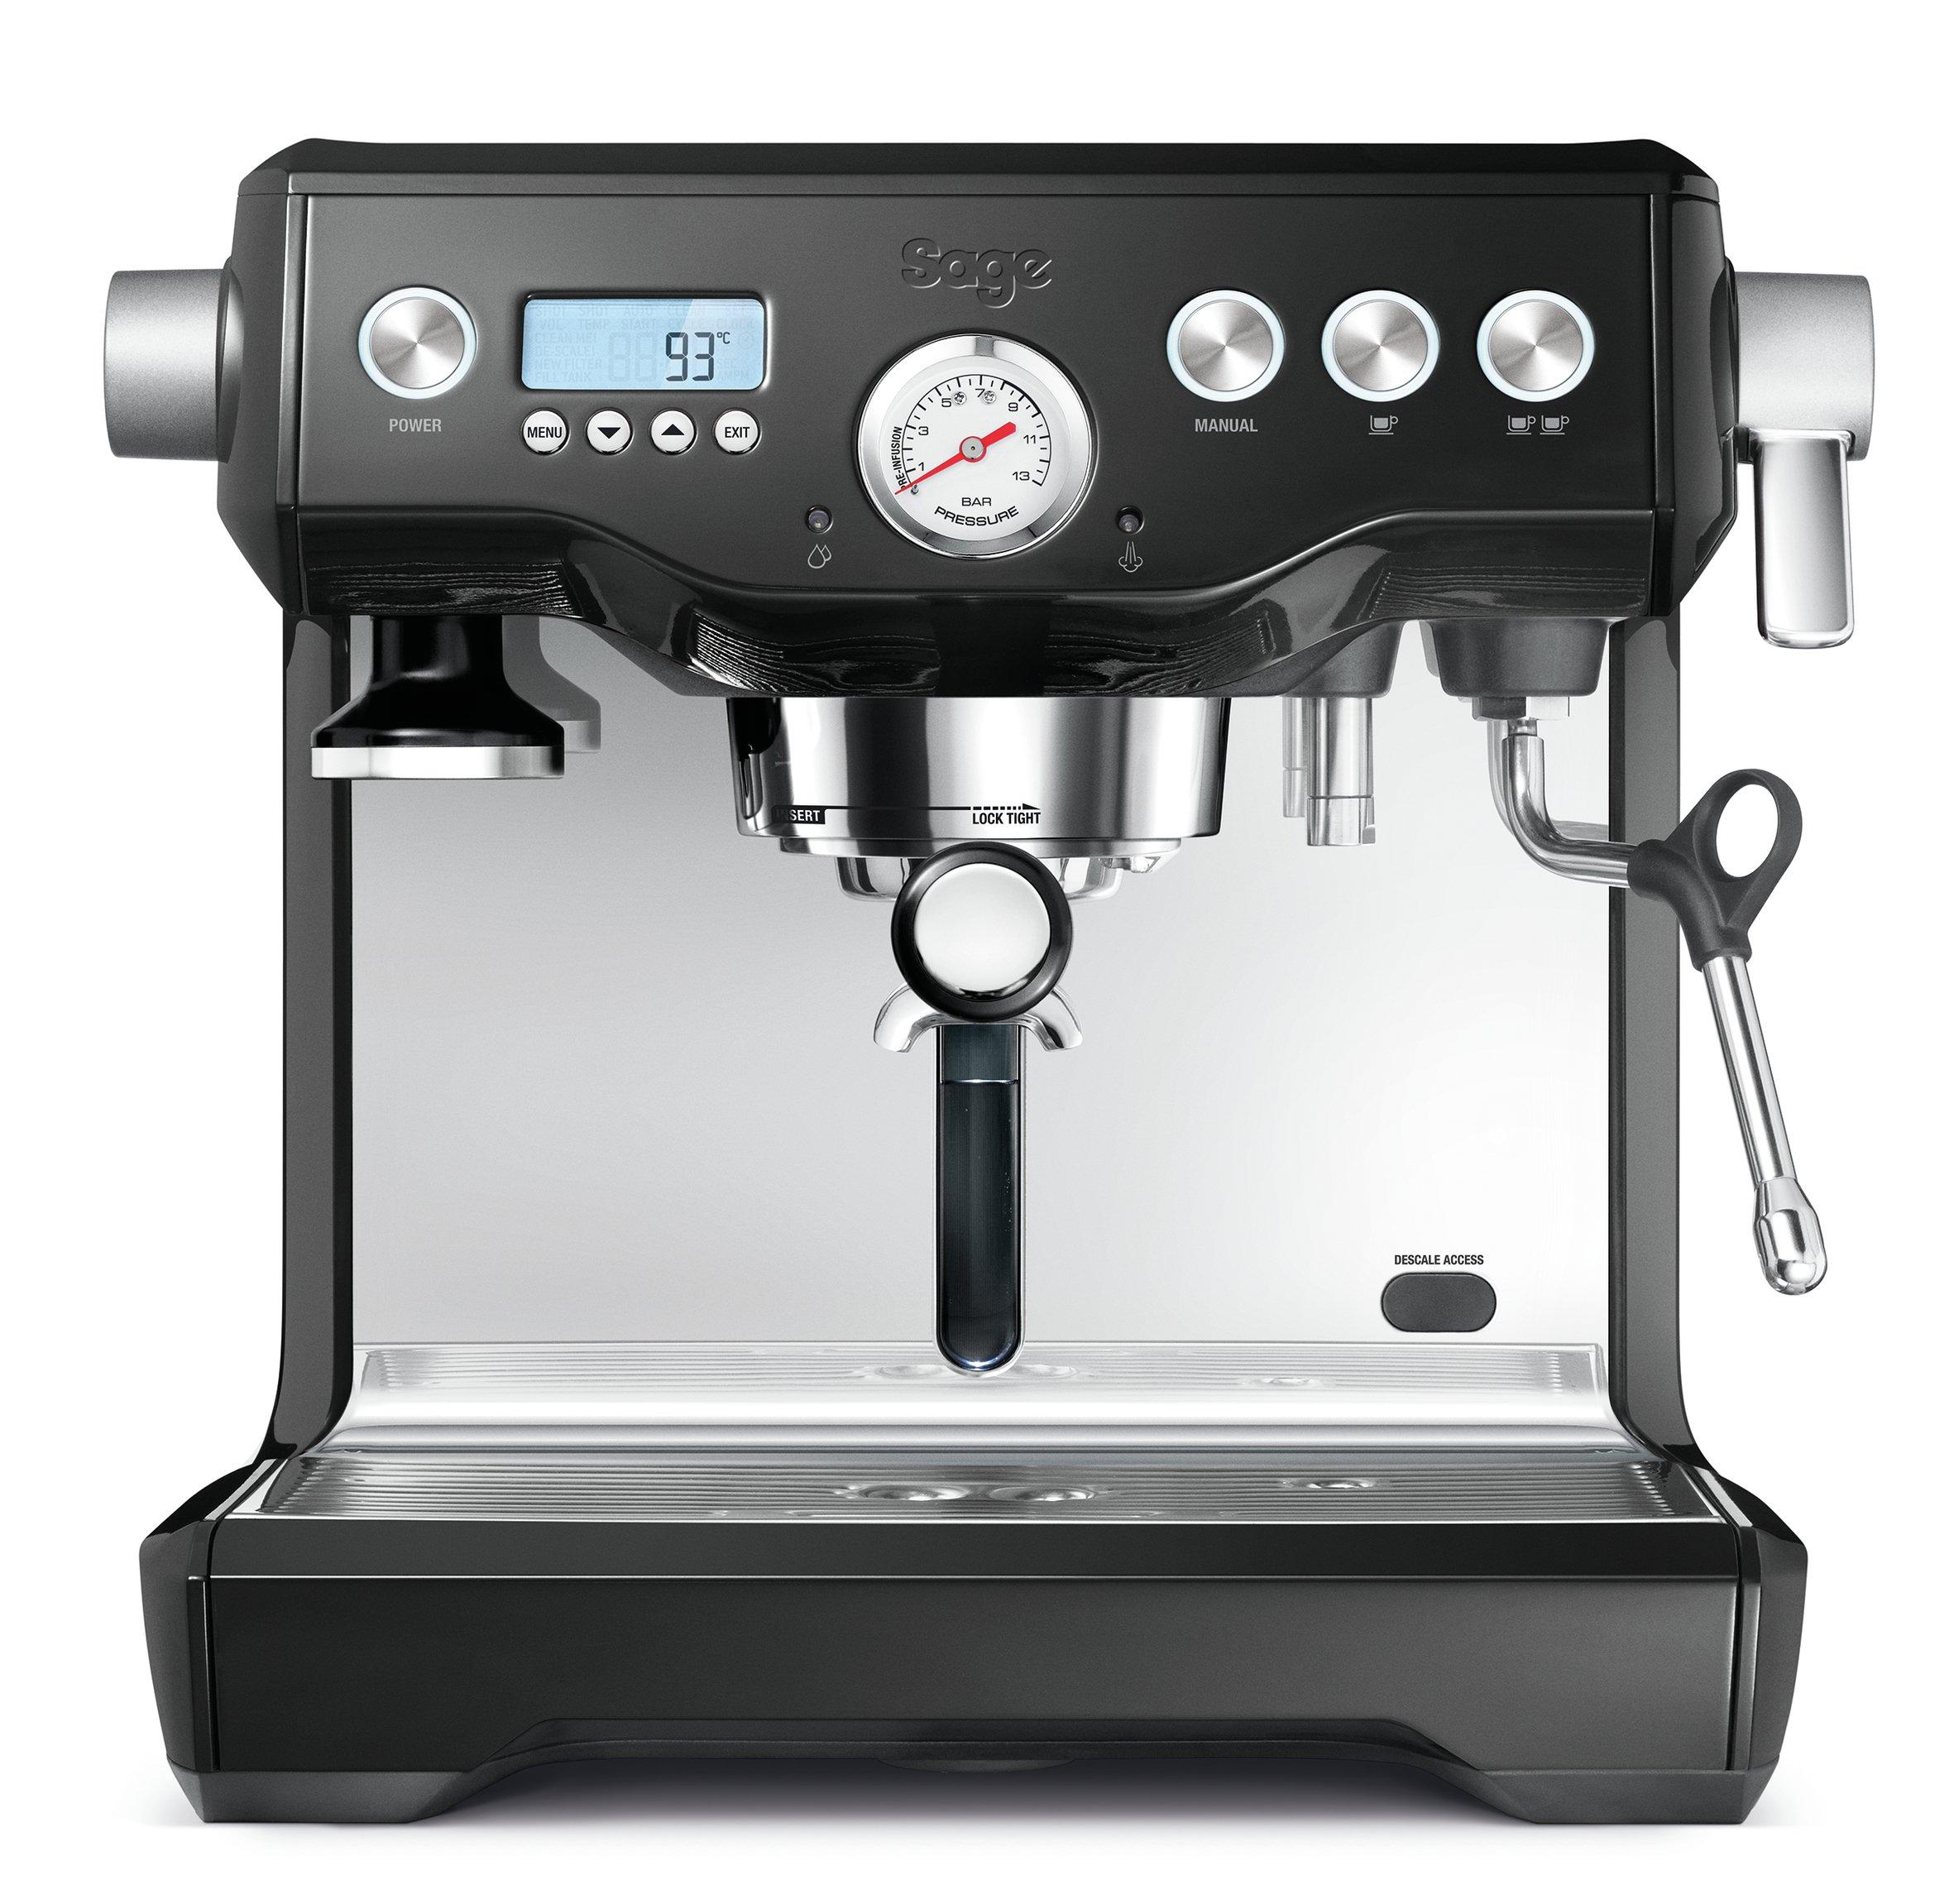 Sage-by-Heston-Blumenthal-the-Dual-Boiler-Coffee-Machine-2200-W-Silver